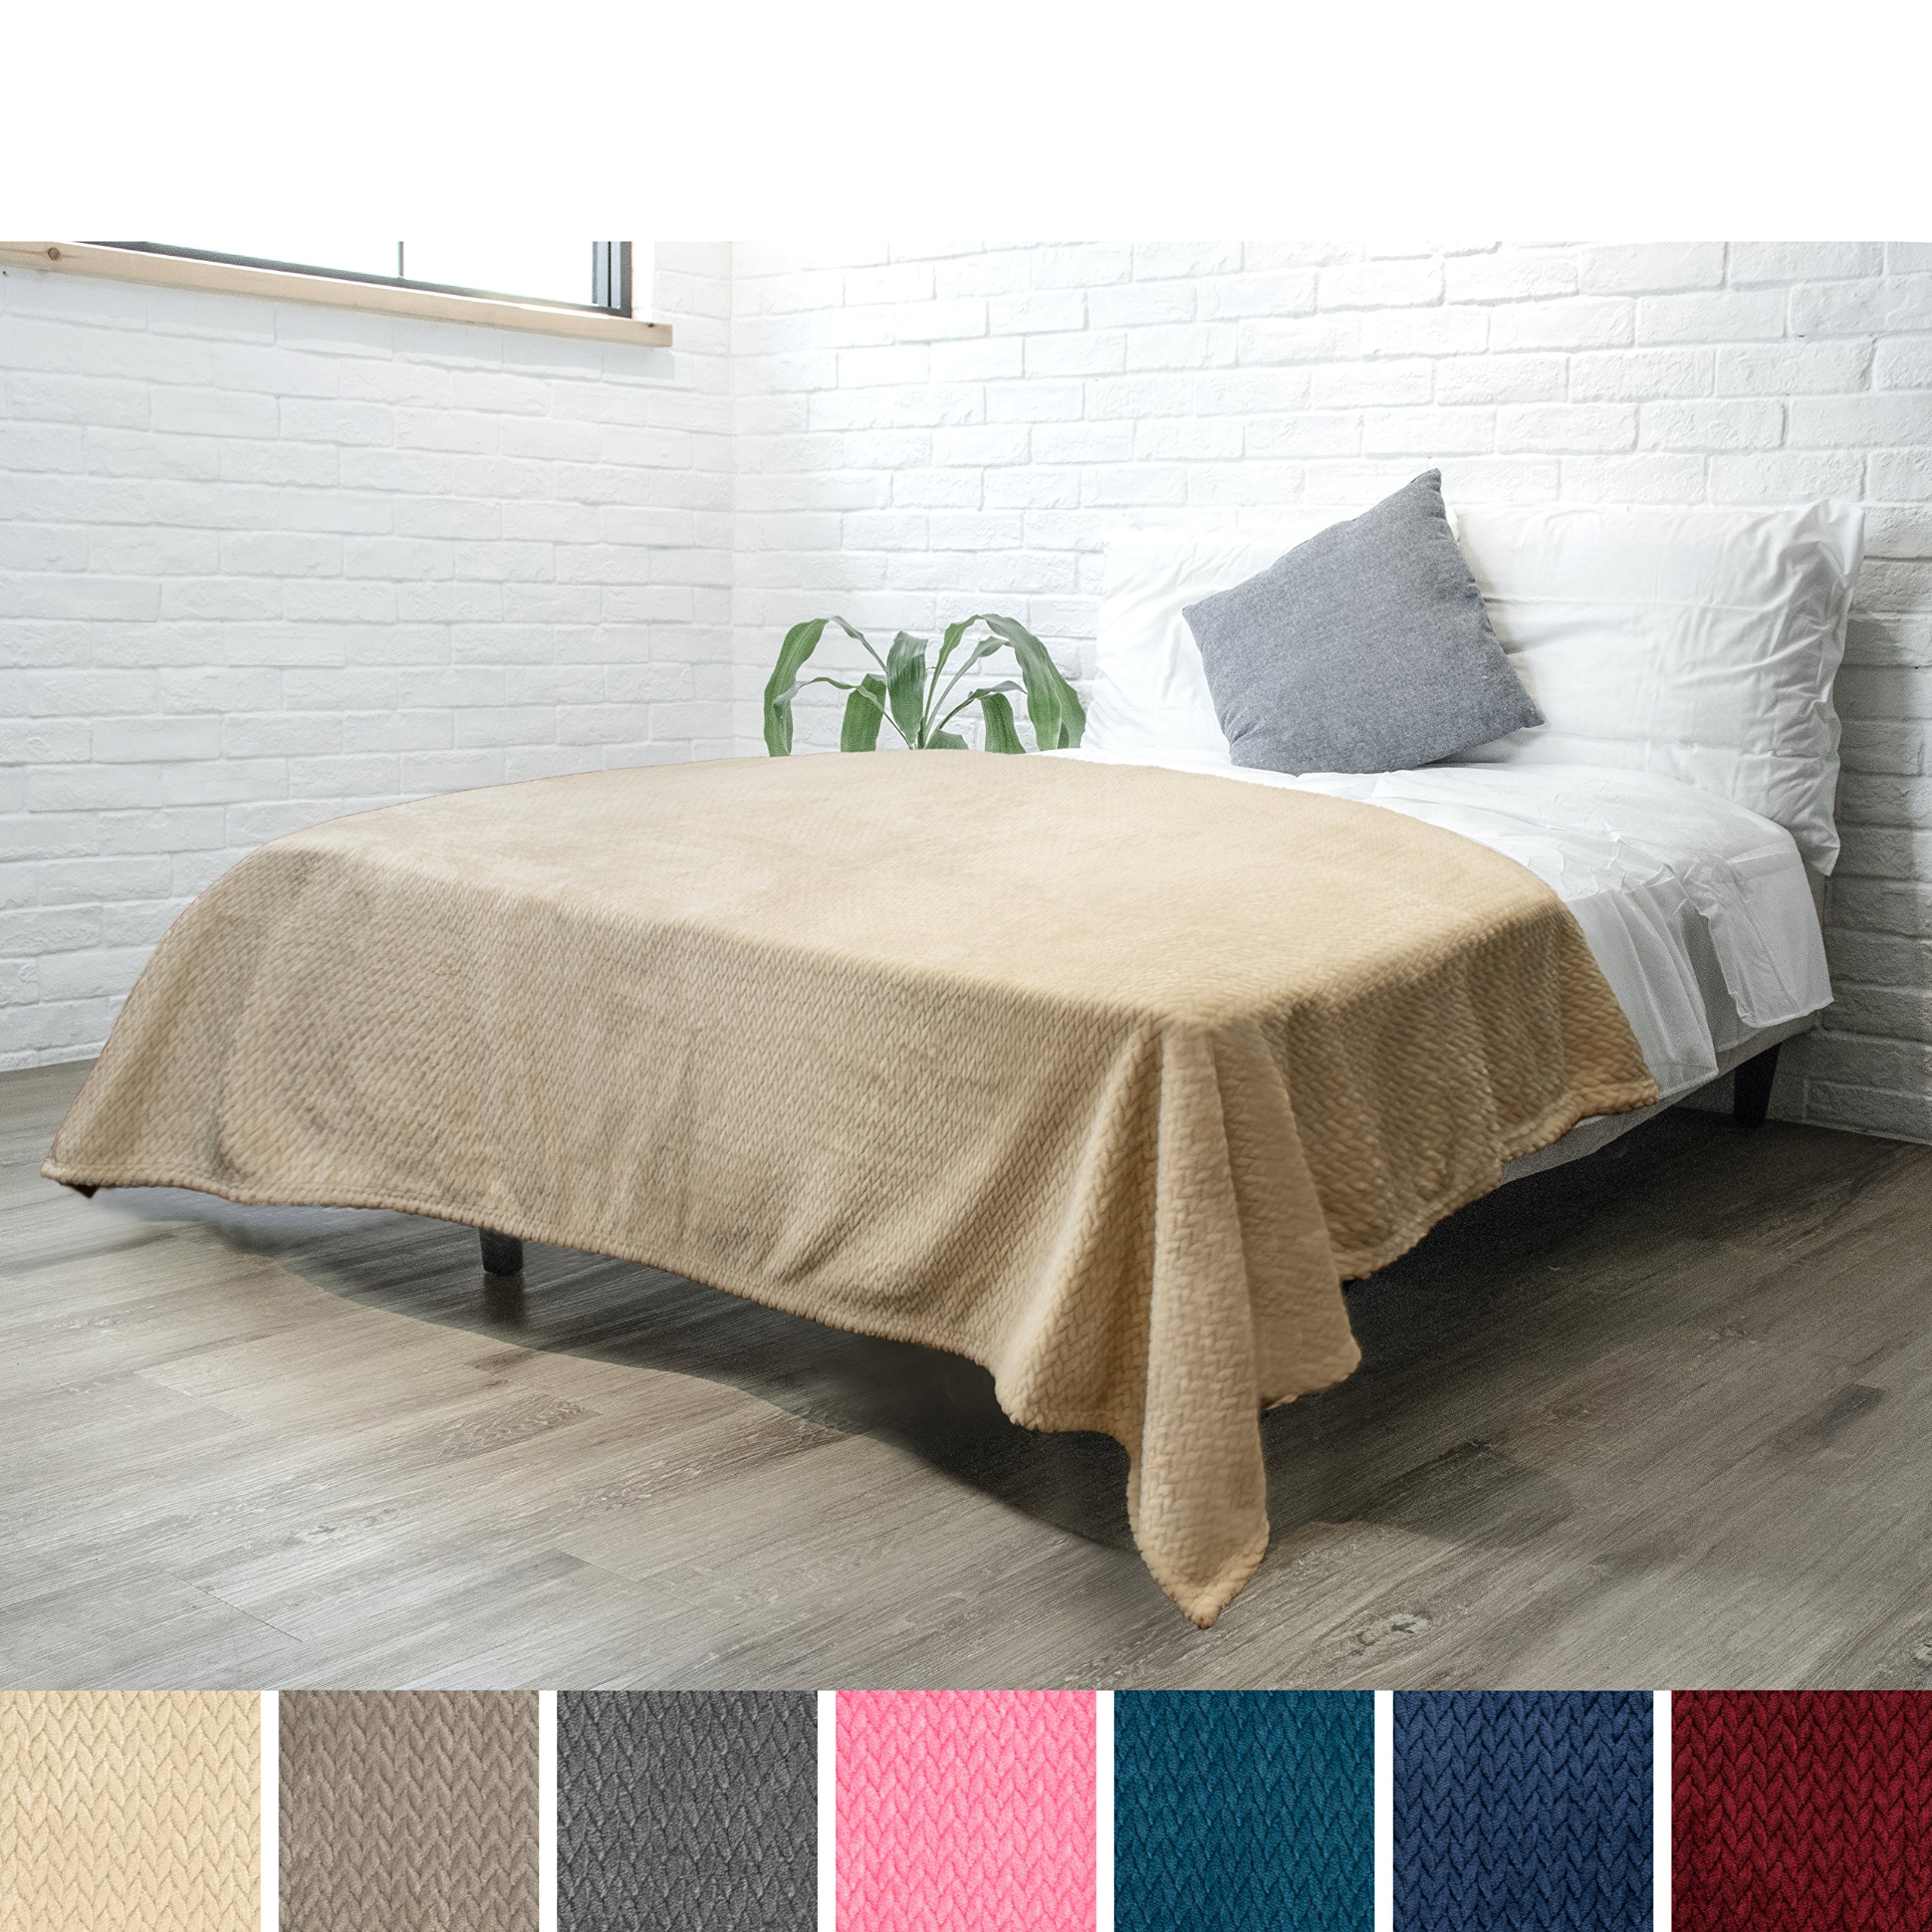 PAVILIA Luxury Soft Plush Latte Beige Blanket for Twin Bed, Sofa, Couch | Silky Velvet Fleece Chevron Pattern | Cozy, Warm, Fuzzy Lightweight Microfiber | All Season Use | 60 x 80 Inches